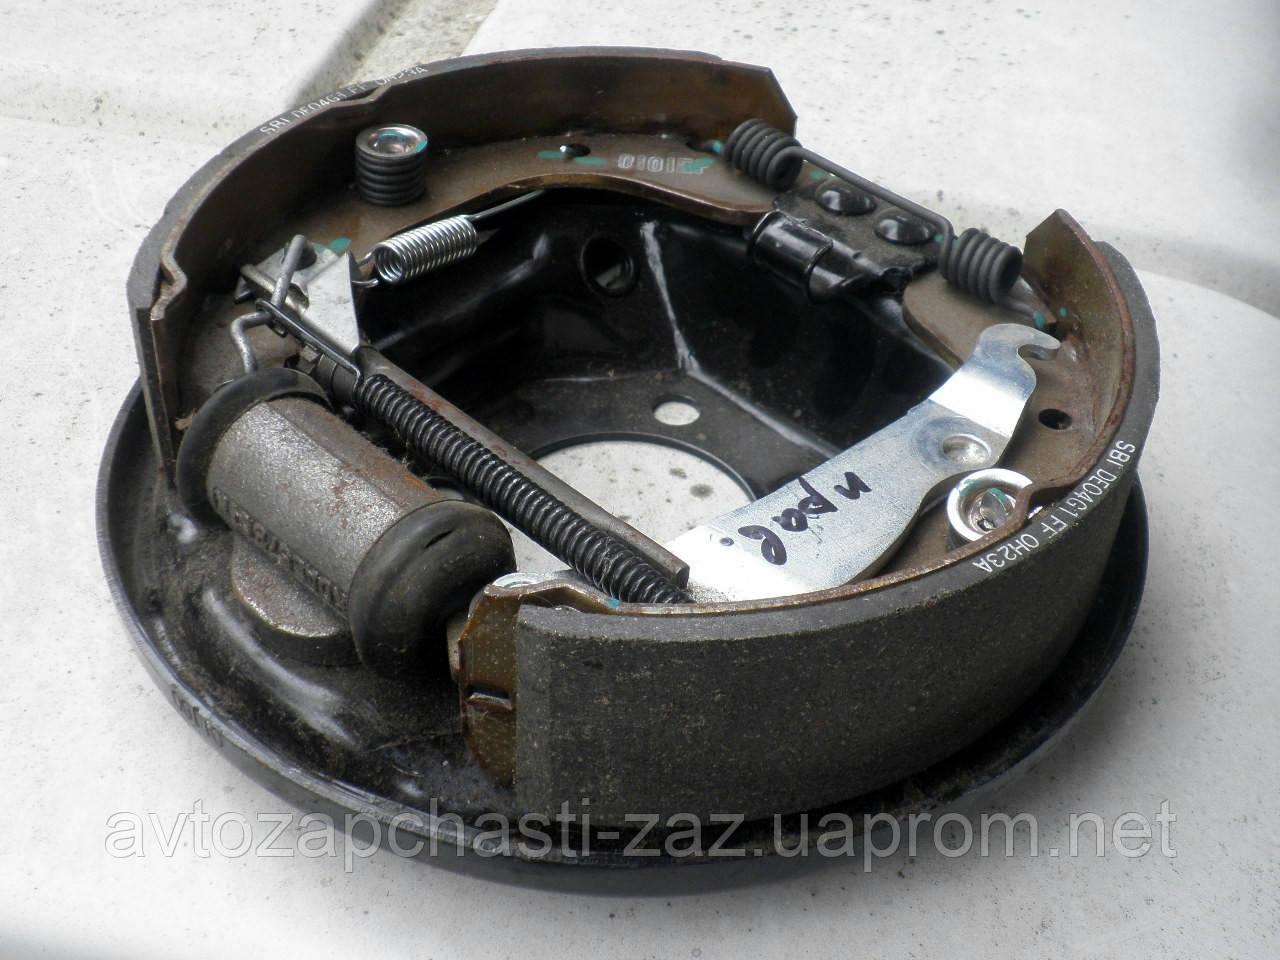 Щит заднего тормоза DAC 96430413 Lanos / Гальмо заднього колеса / Тормоз задний на Ланос 96430414 DAC, Корея